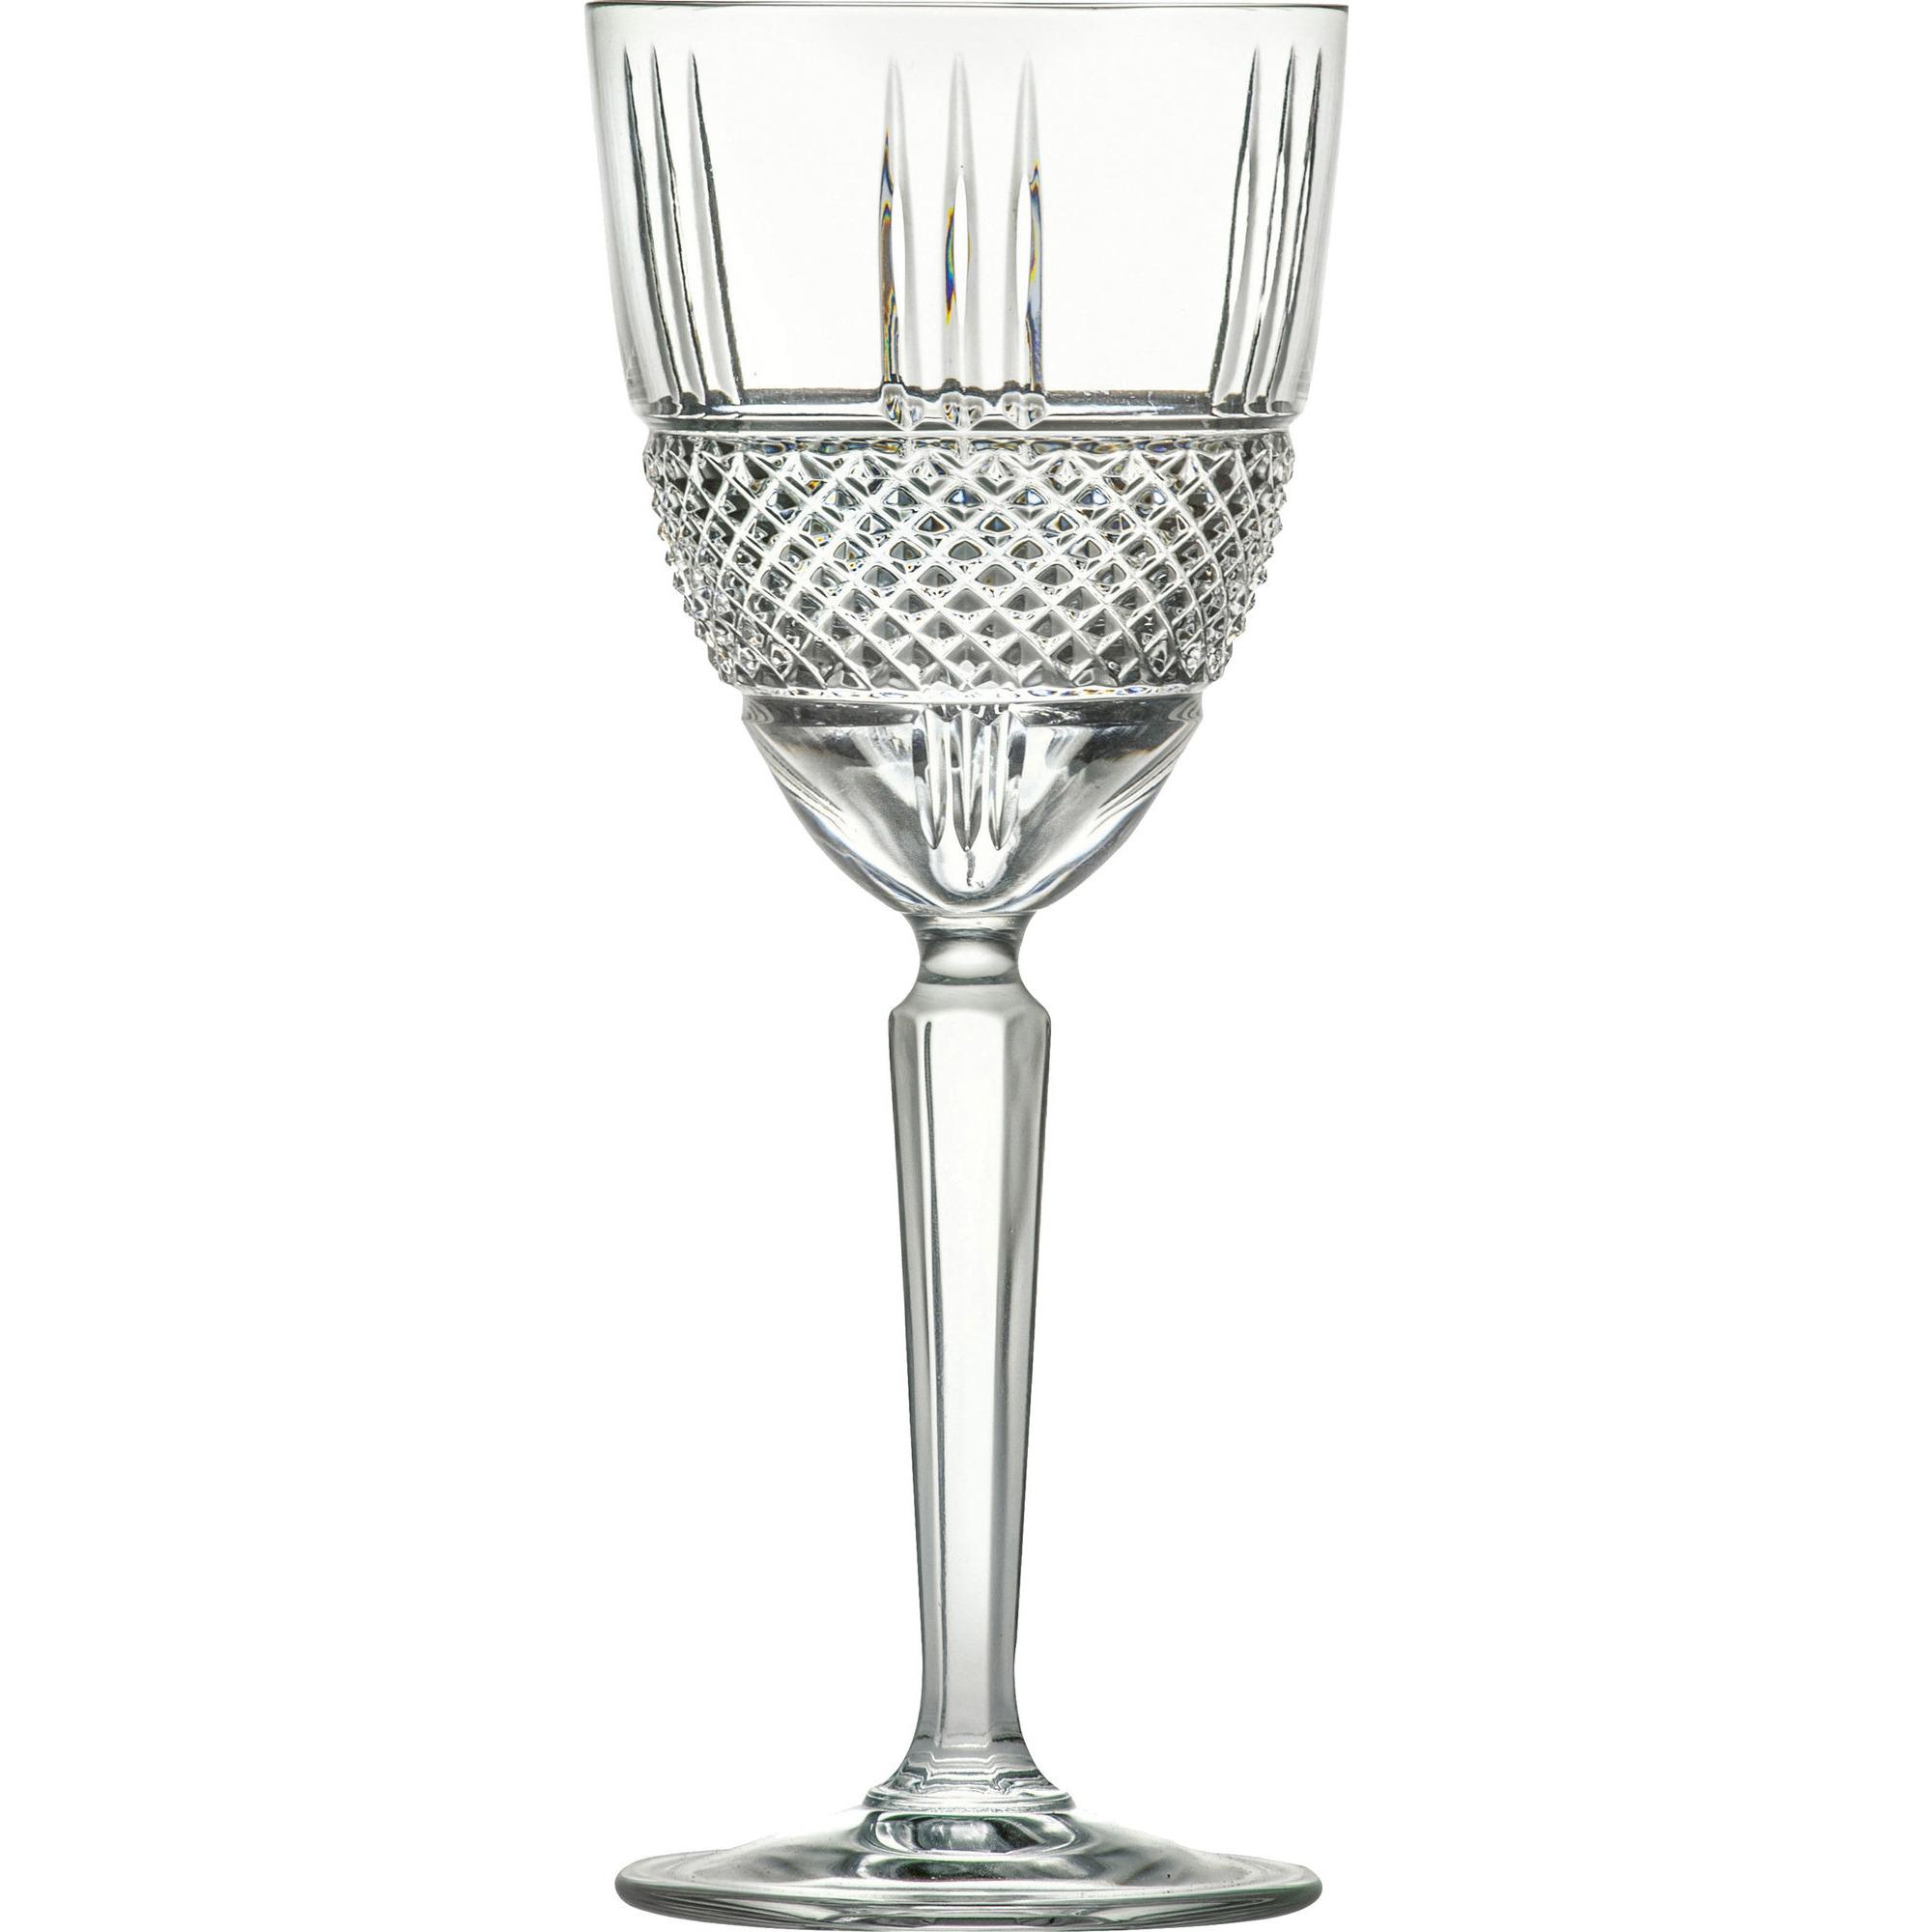 Lyngby Glas Brilliante Vitvinsglas 4 st